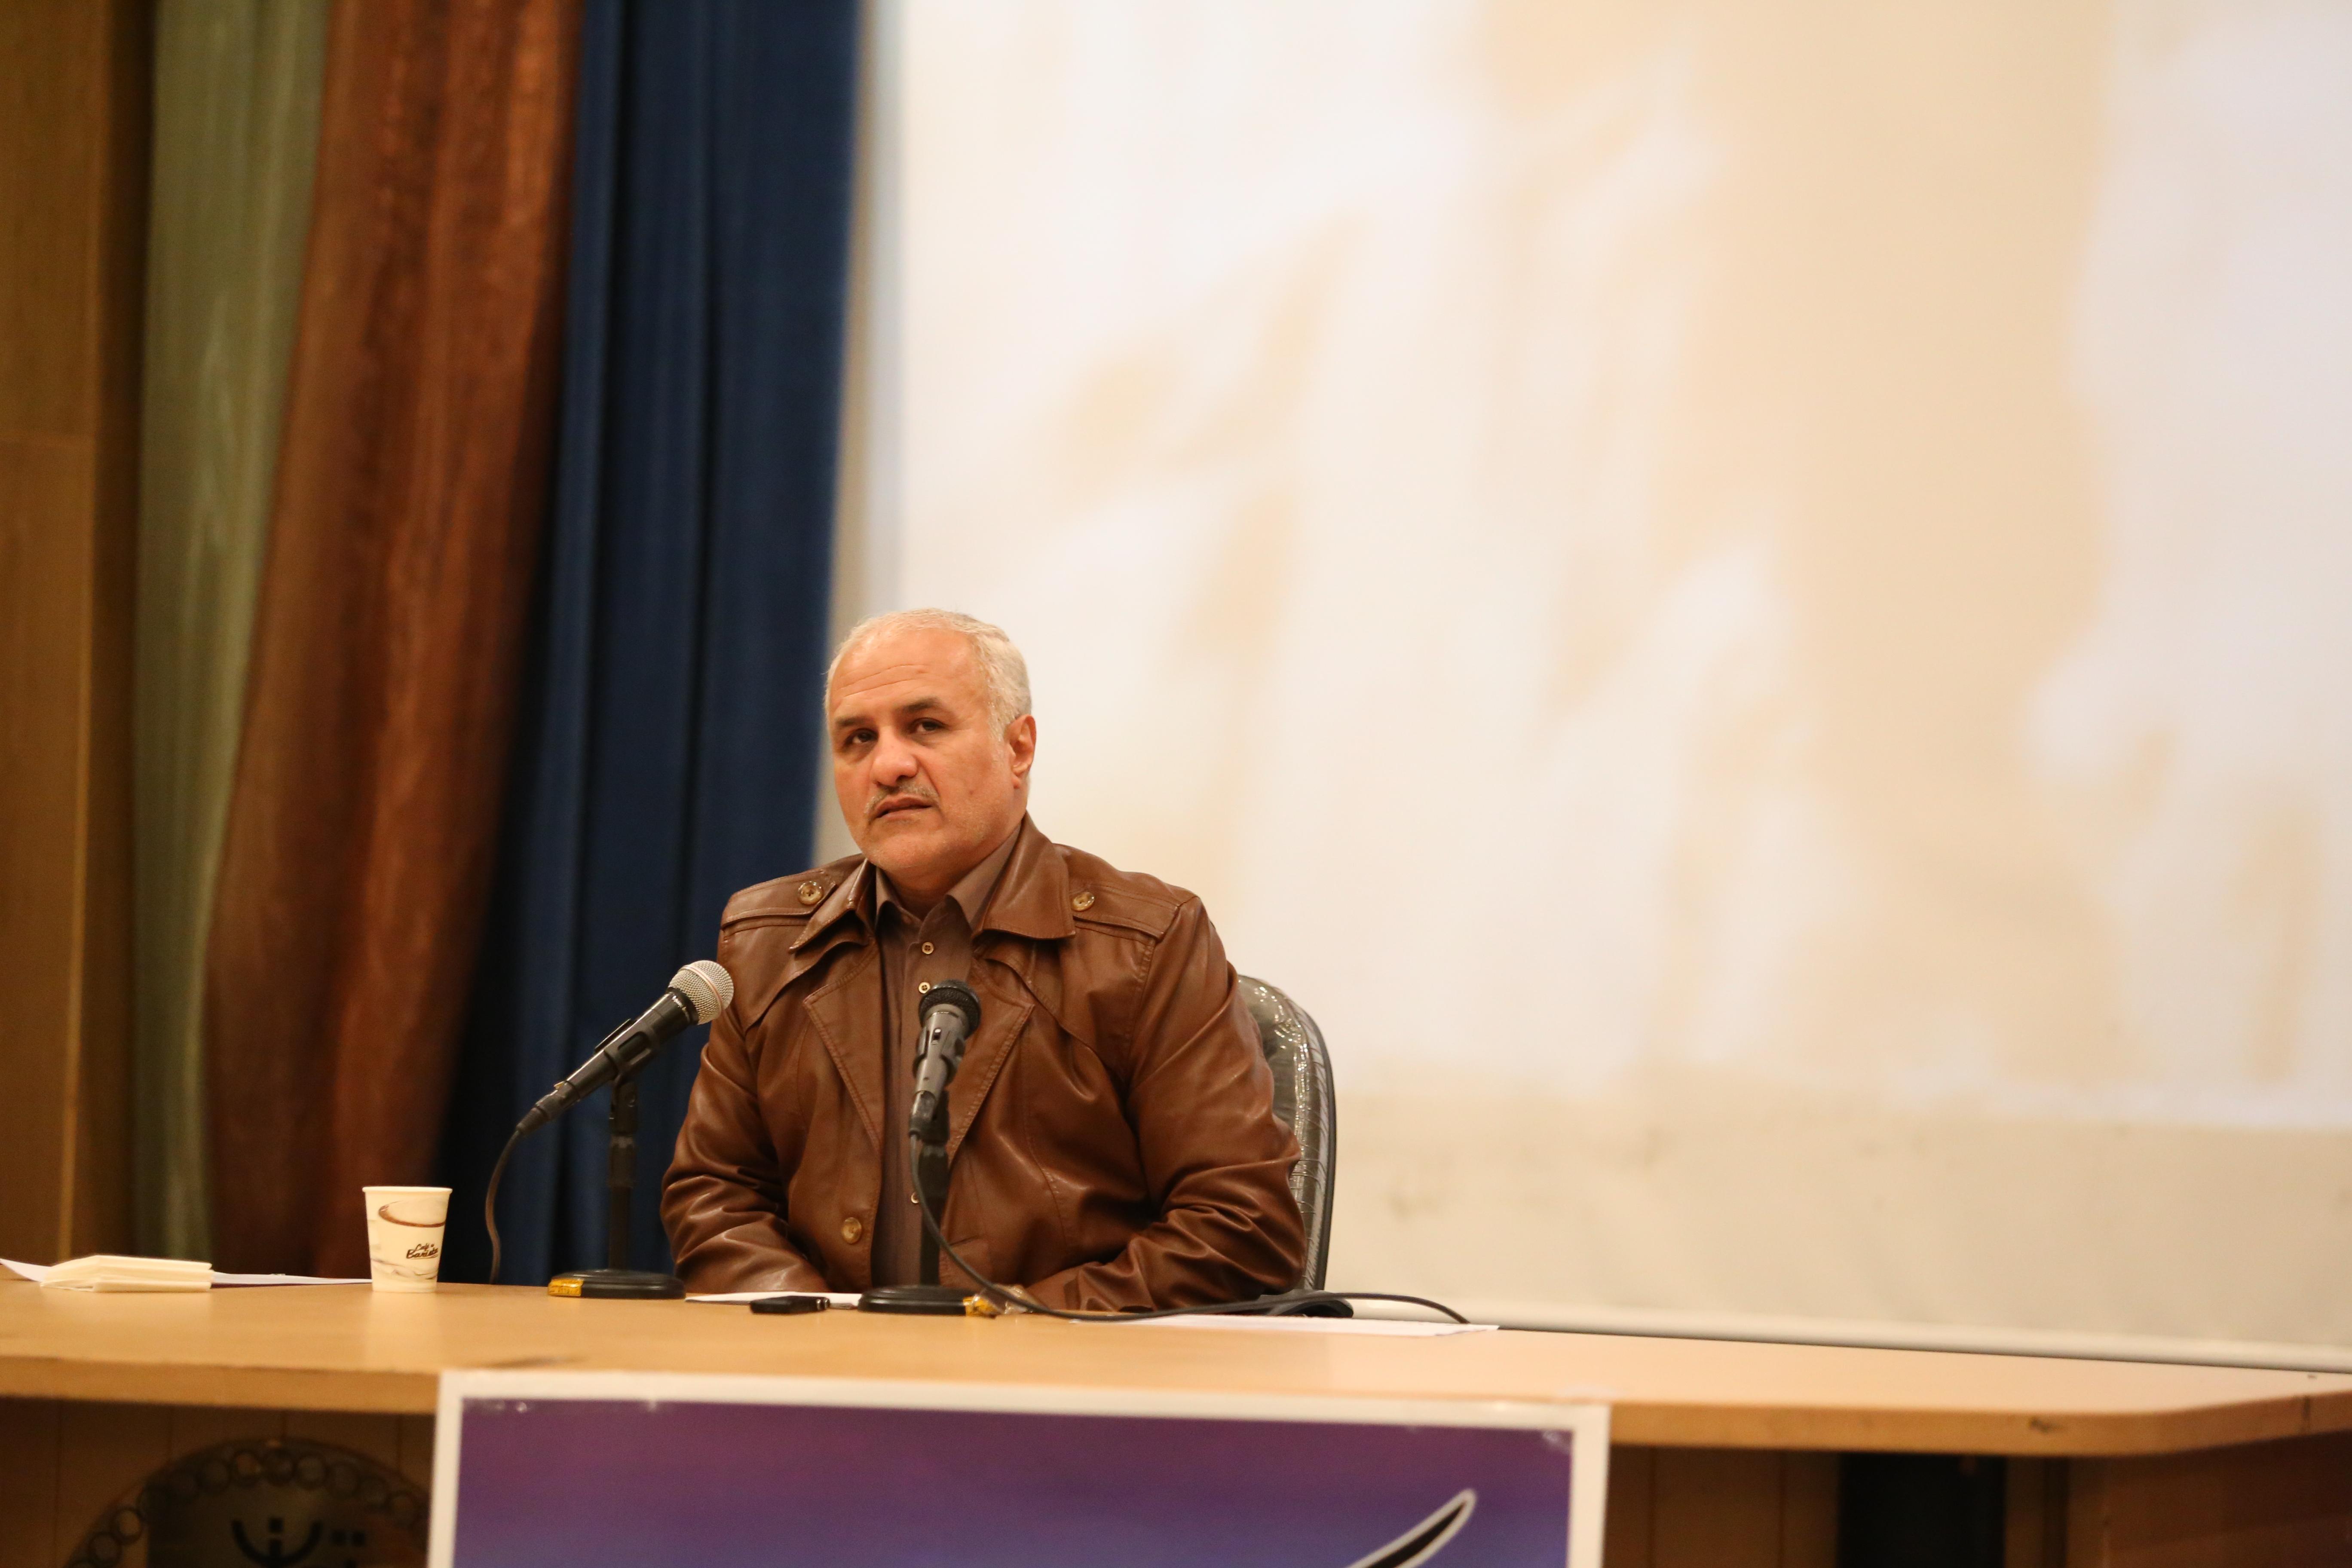 IMG 9741 دانلود سخنرانی استاد حسن عباسی با موضوع سایه روشنهای نفوذ